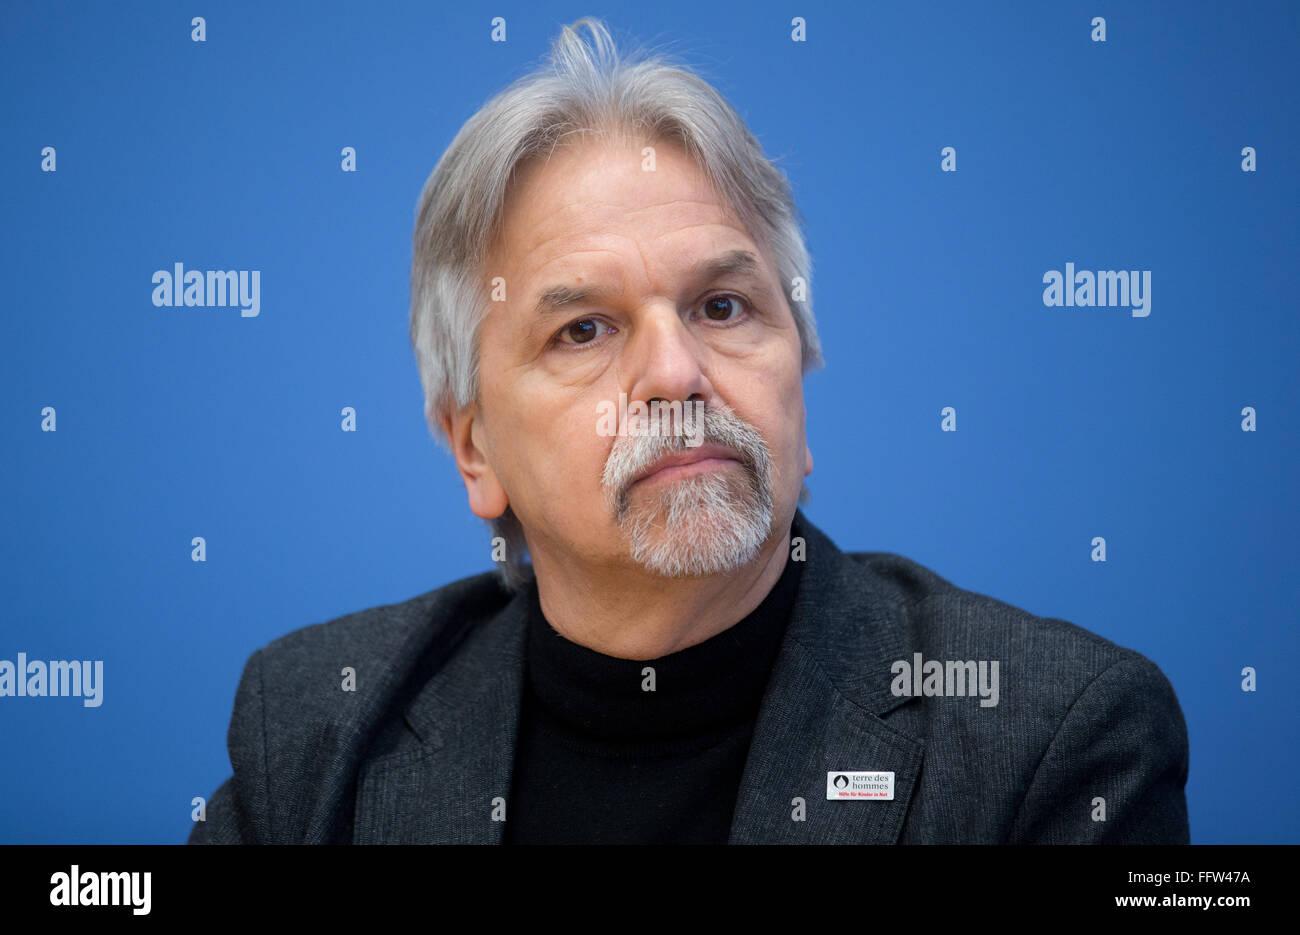 Berlin, Germany. 17th Feb, 2016. Board member of terre des hommes, Albert Recknagel, speaks at a federal press conference - Stock Image